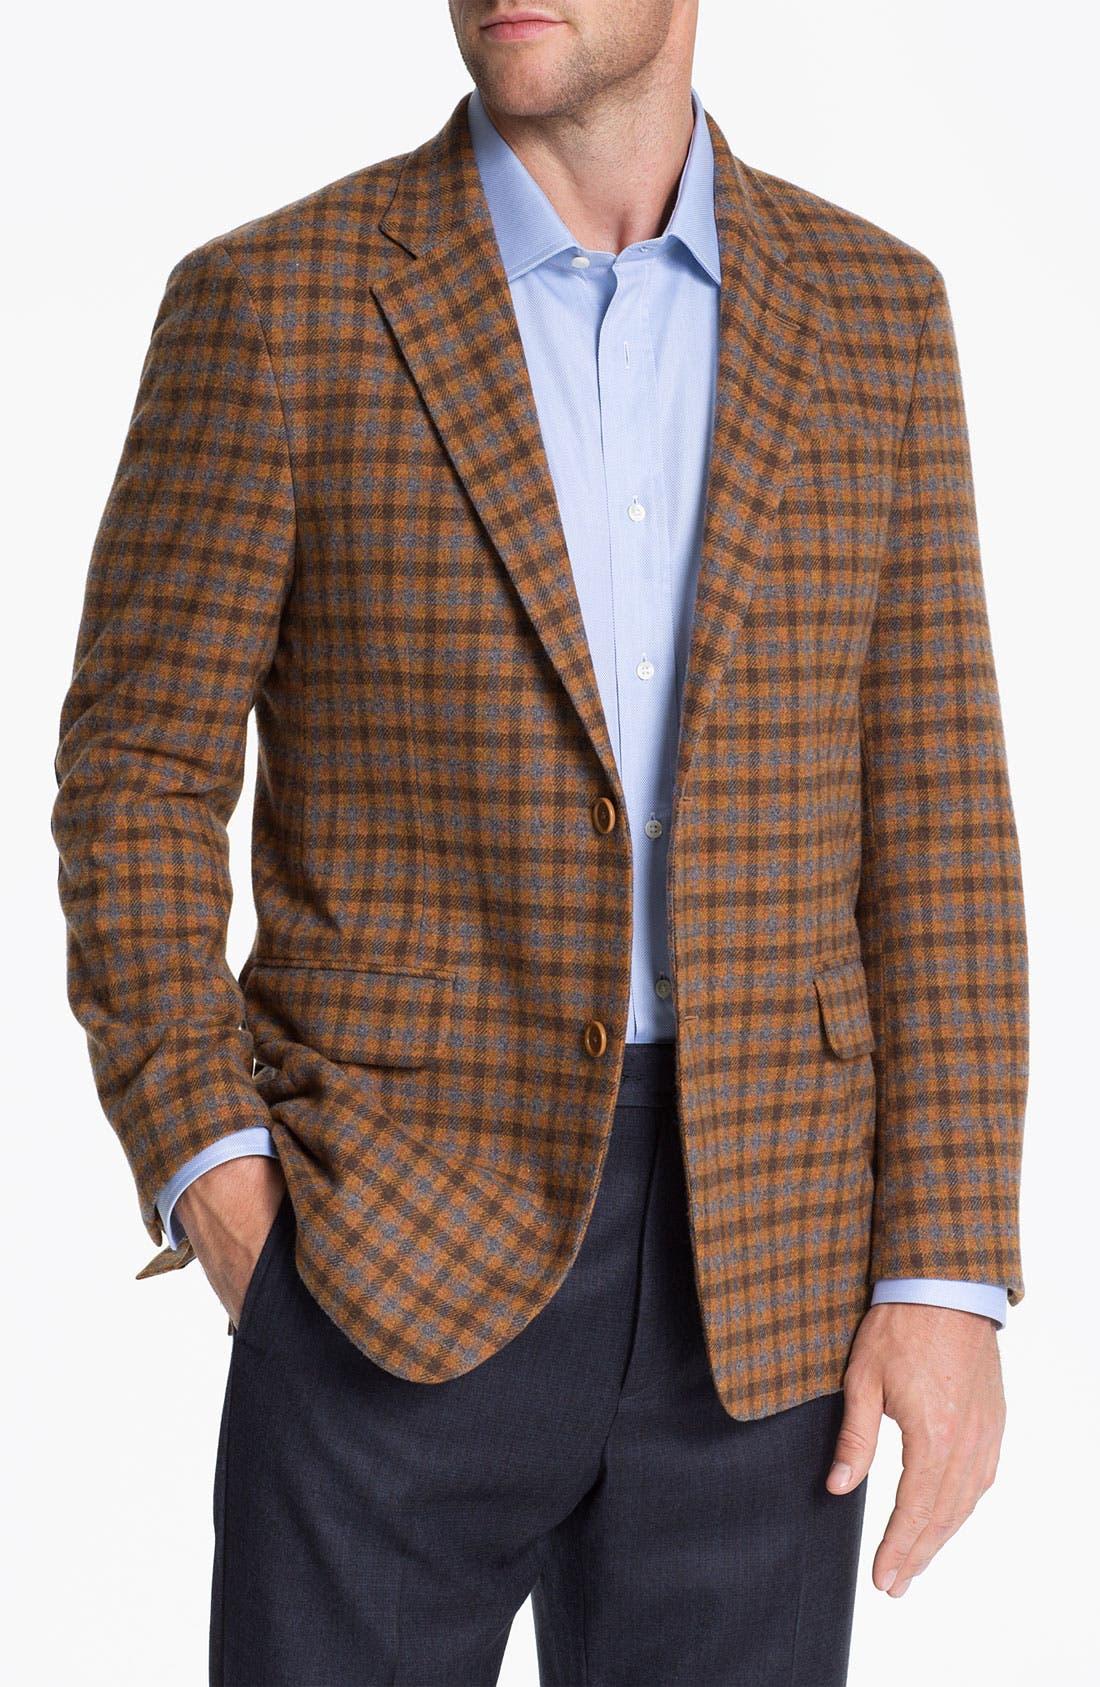 Main Image - Robert Talbott Check Wool Sportcoat